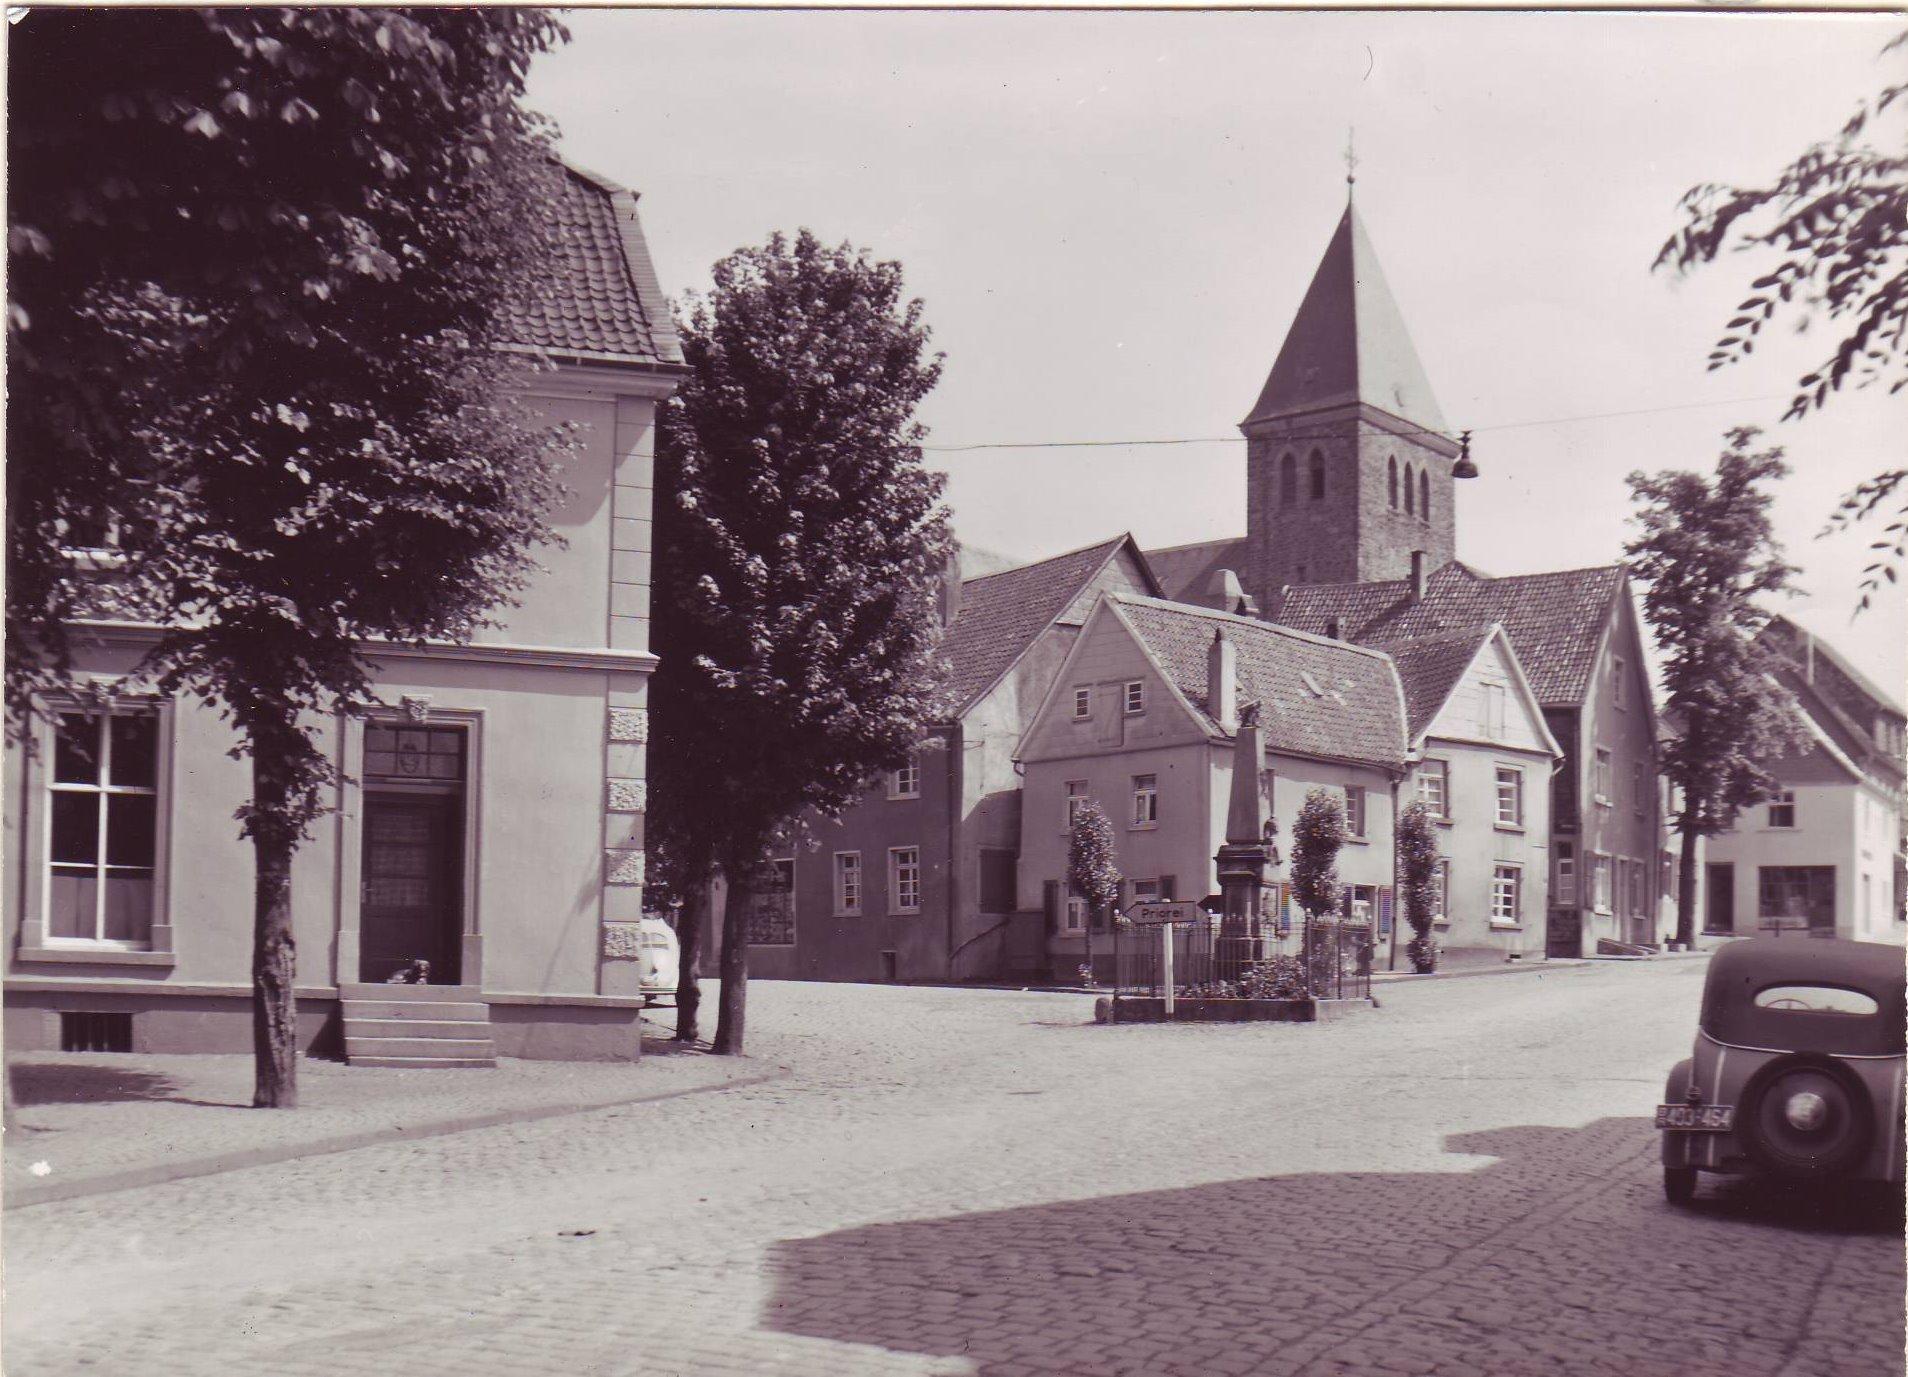 Frankfurter Straße 1948 I